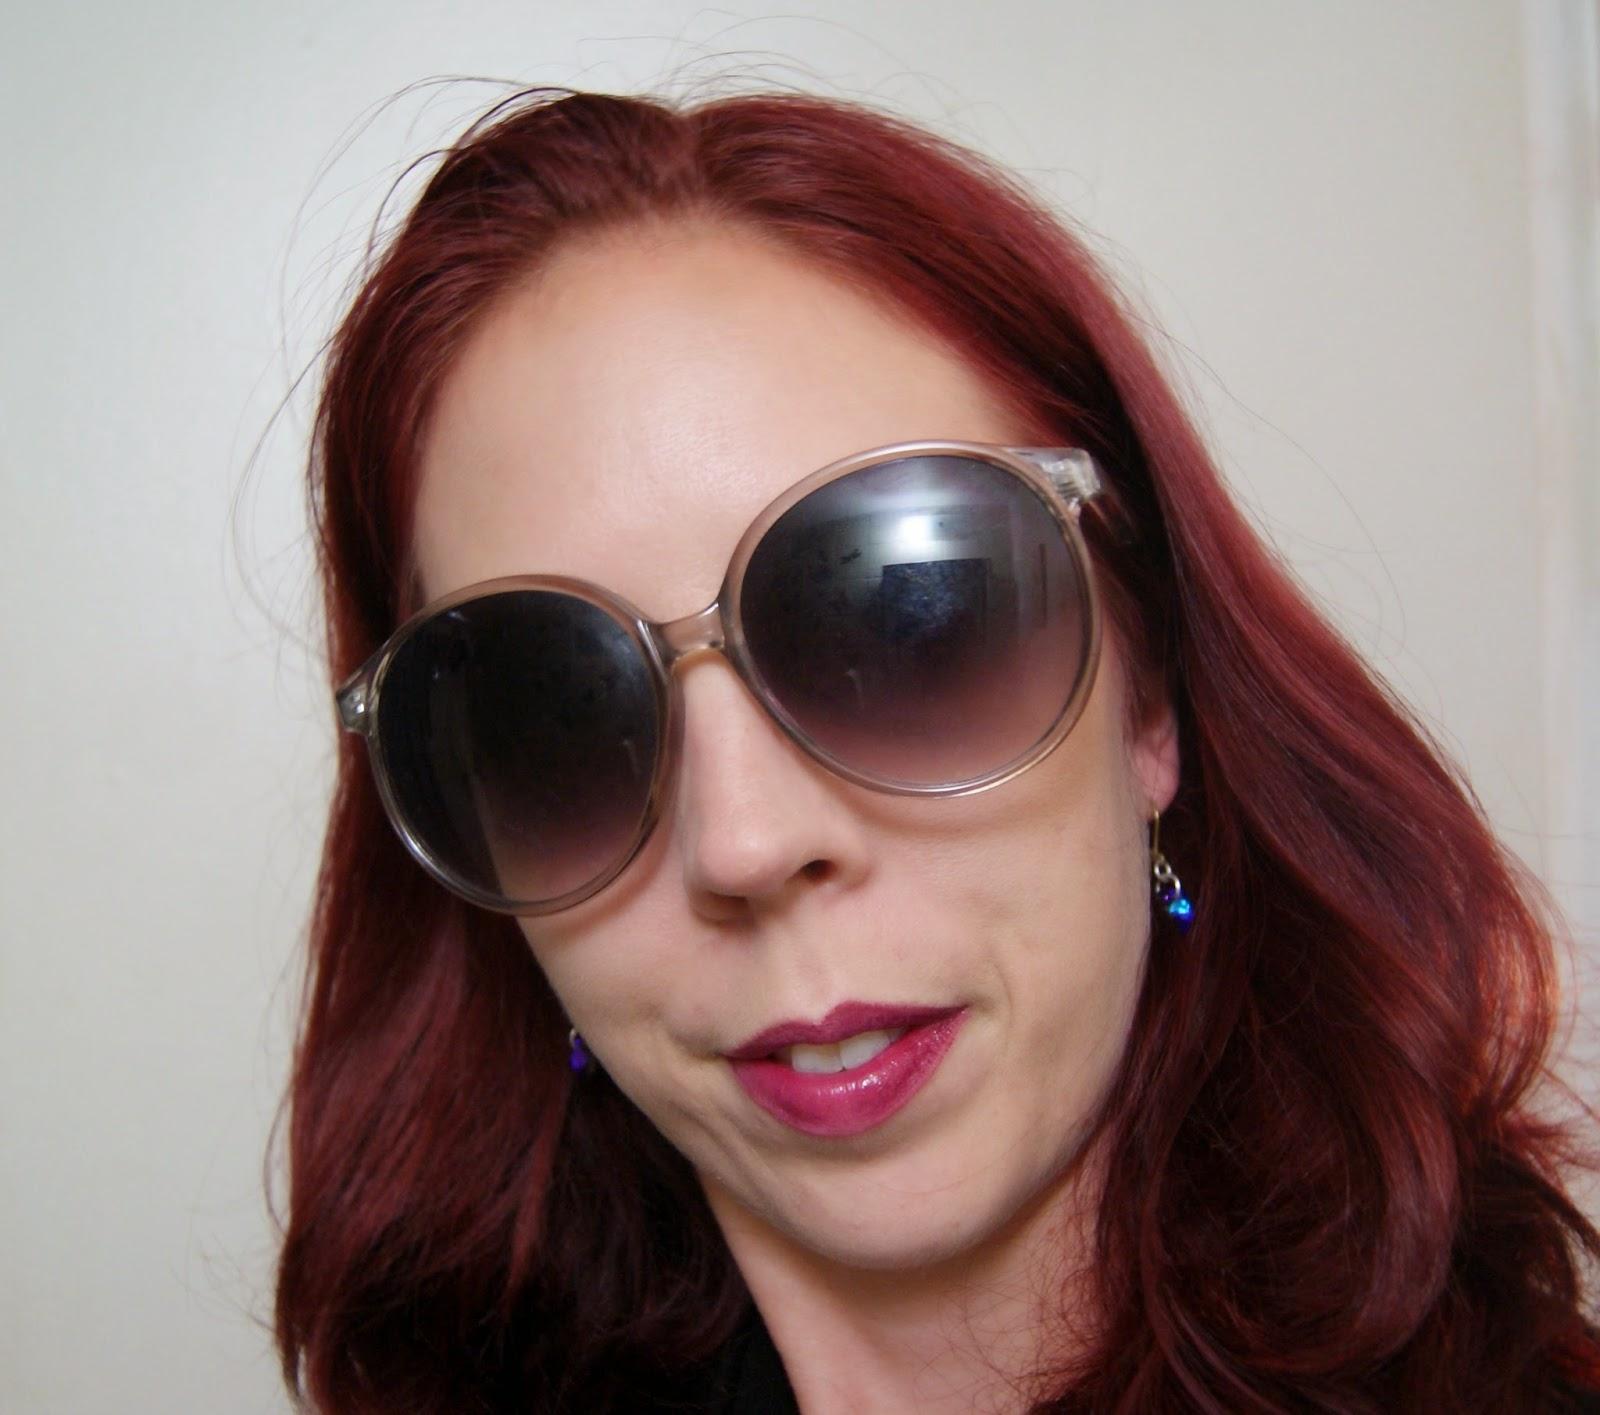 Sunglasses, sunnies, fashion, style, trend, summer, Melanie.Ps, The Purple Scarf, Toronto, Ontario, Canada, Love, H&M